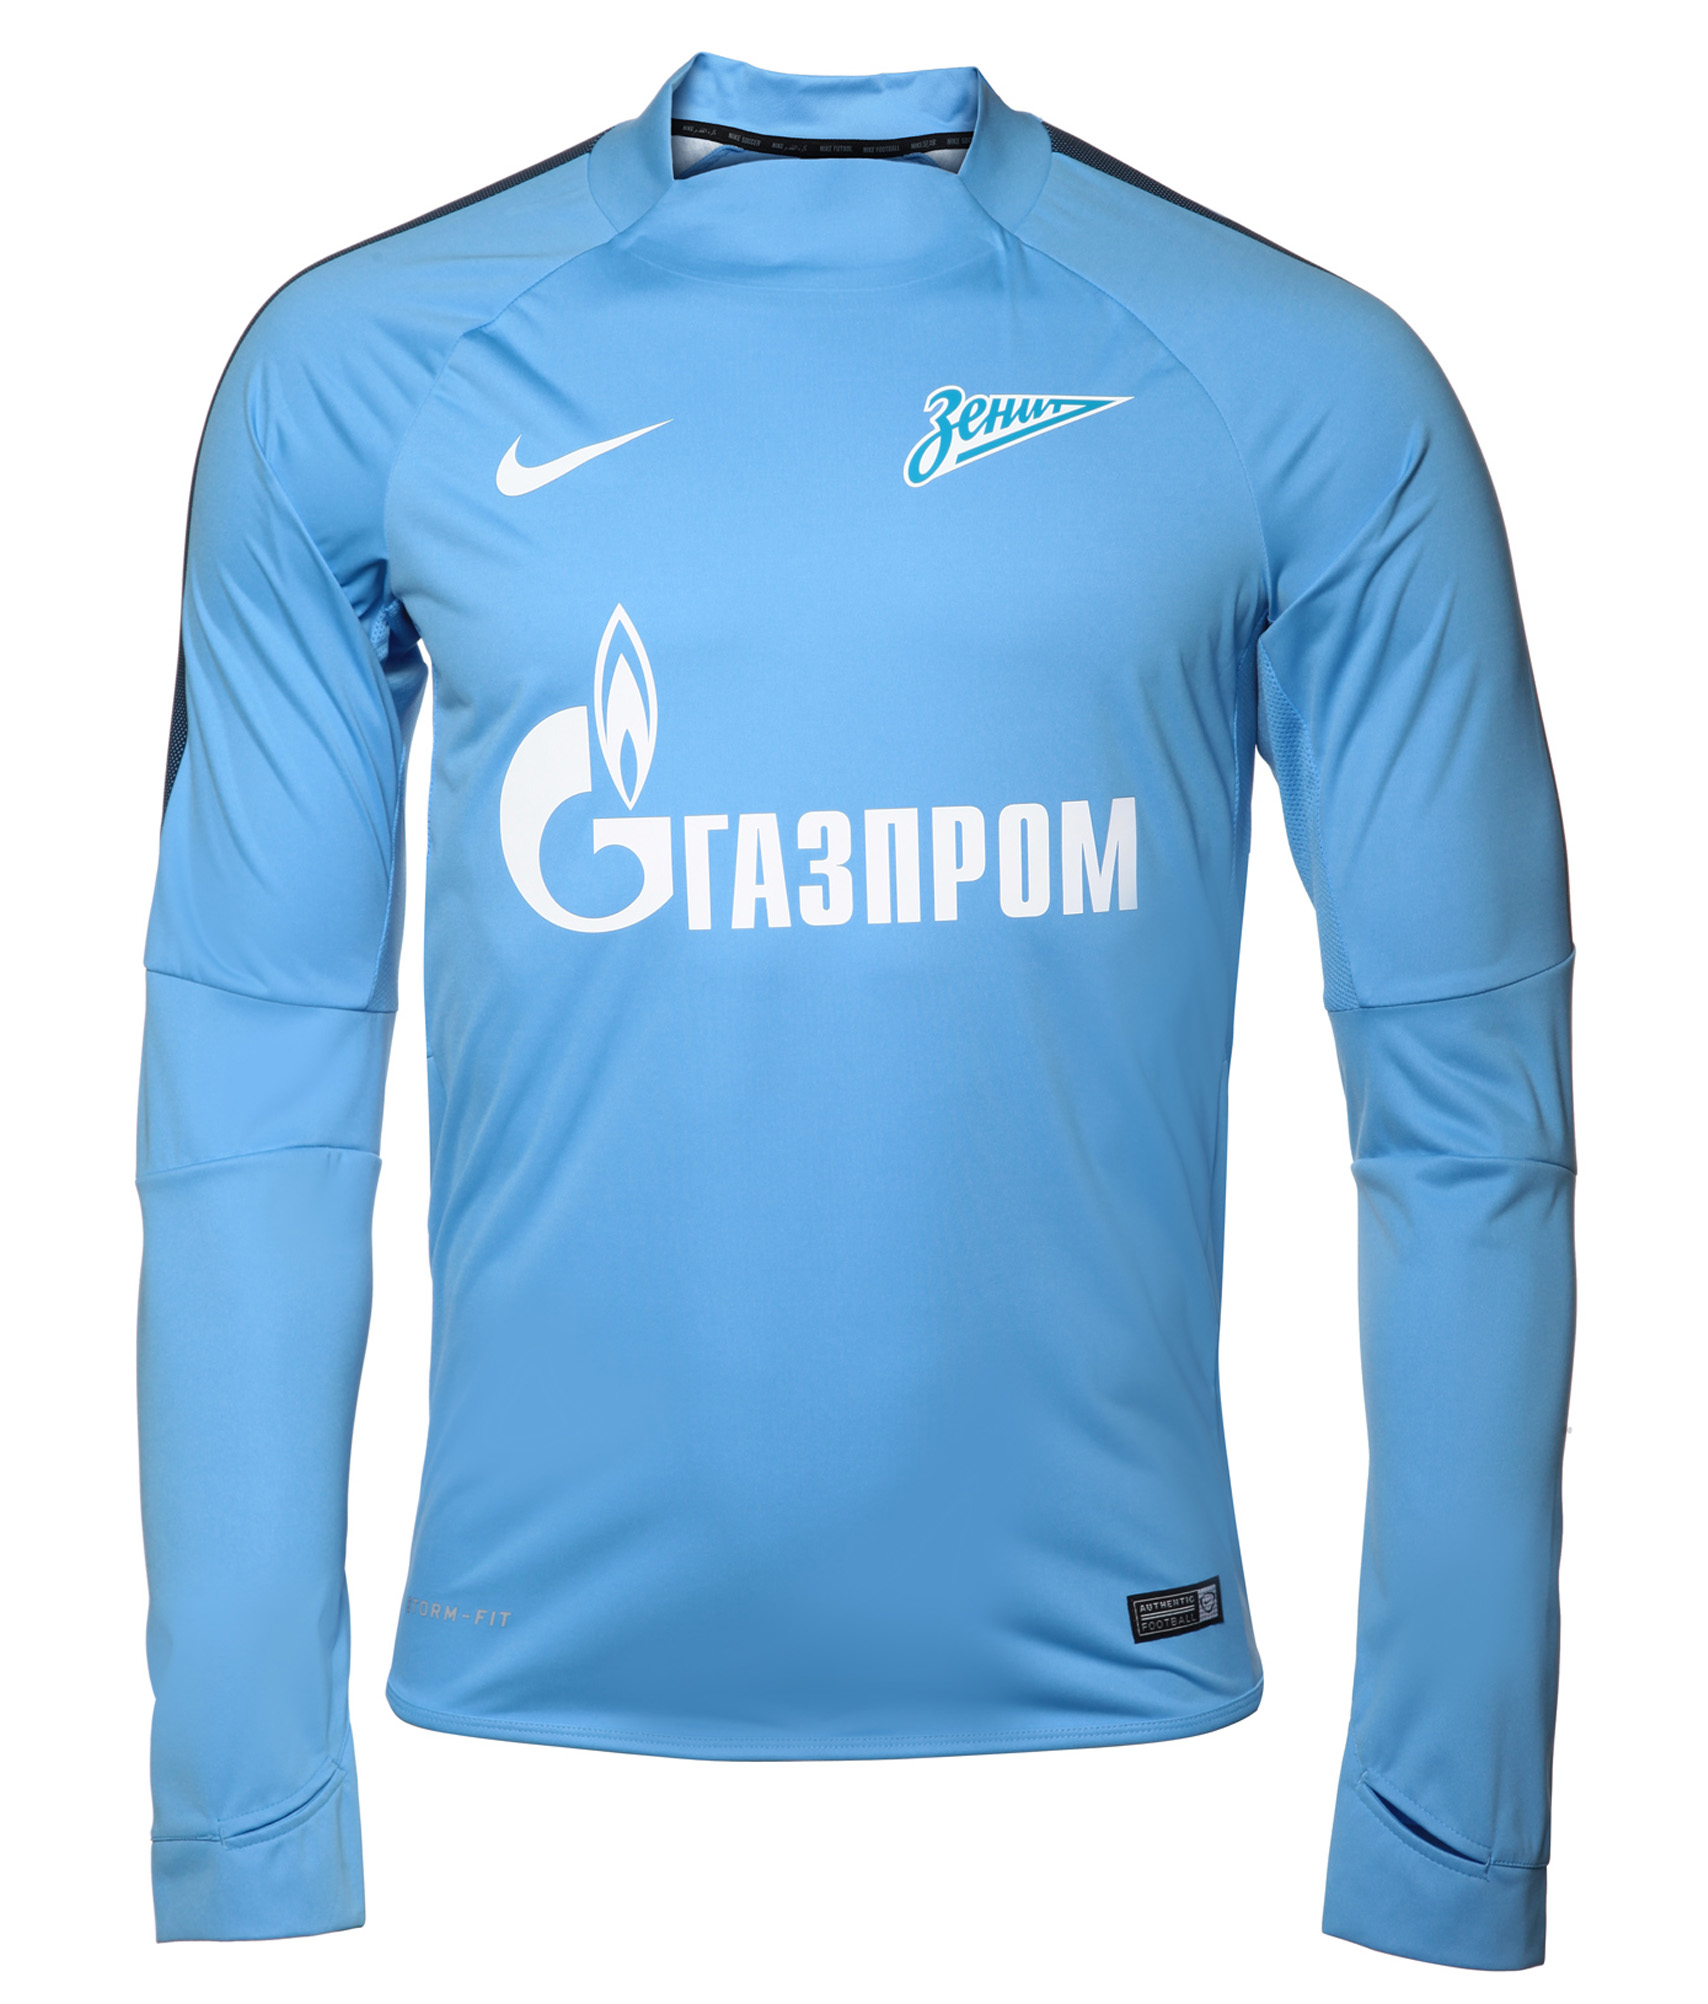 Джемпер тренировочный Nike Nike Цвет-Голубой джемперы nike джемпер nike element sphere 1 2 zip